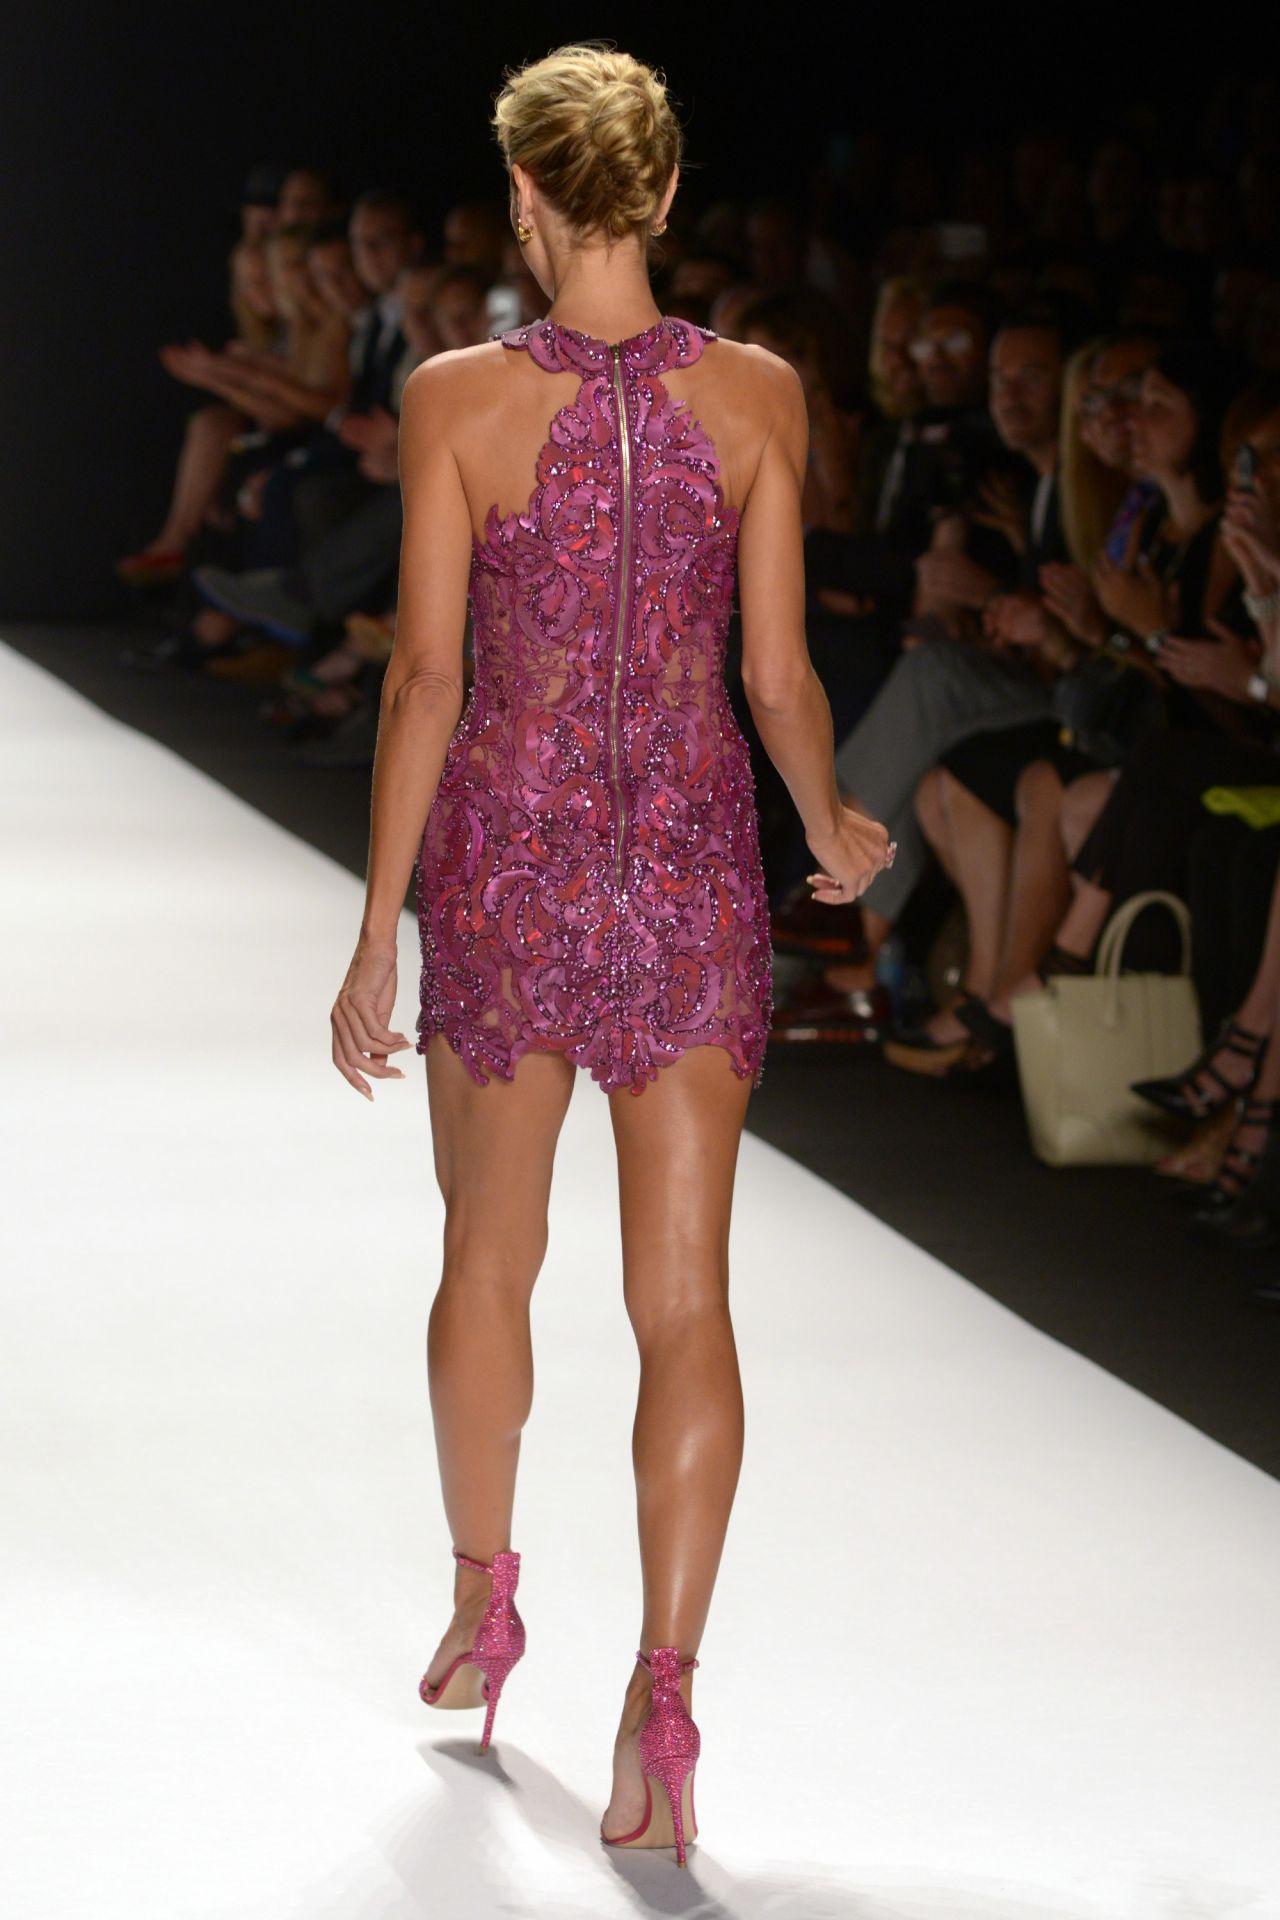 Heidi Klum Project Runway Spring 2015 Fashion Show In